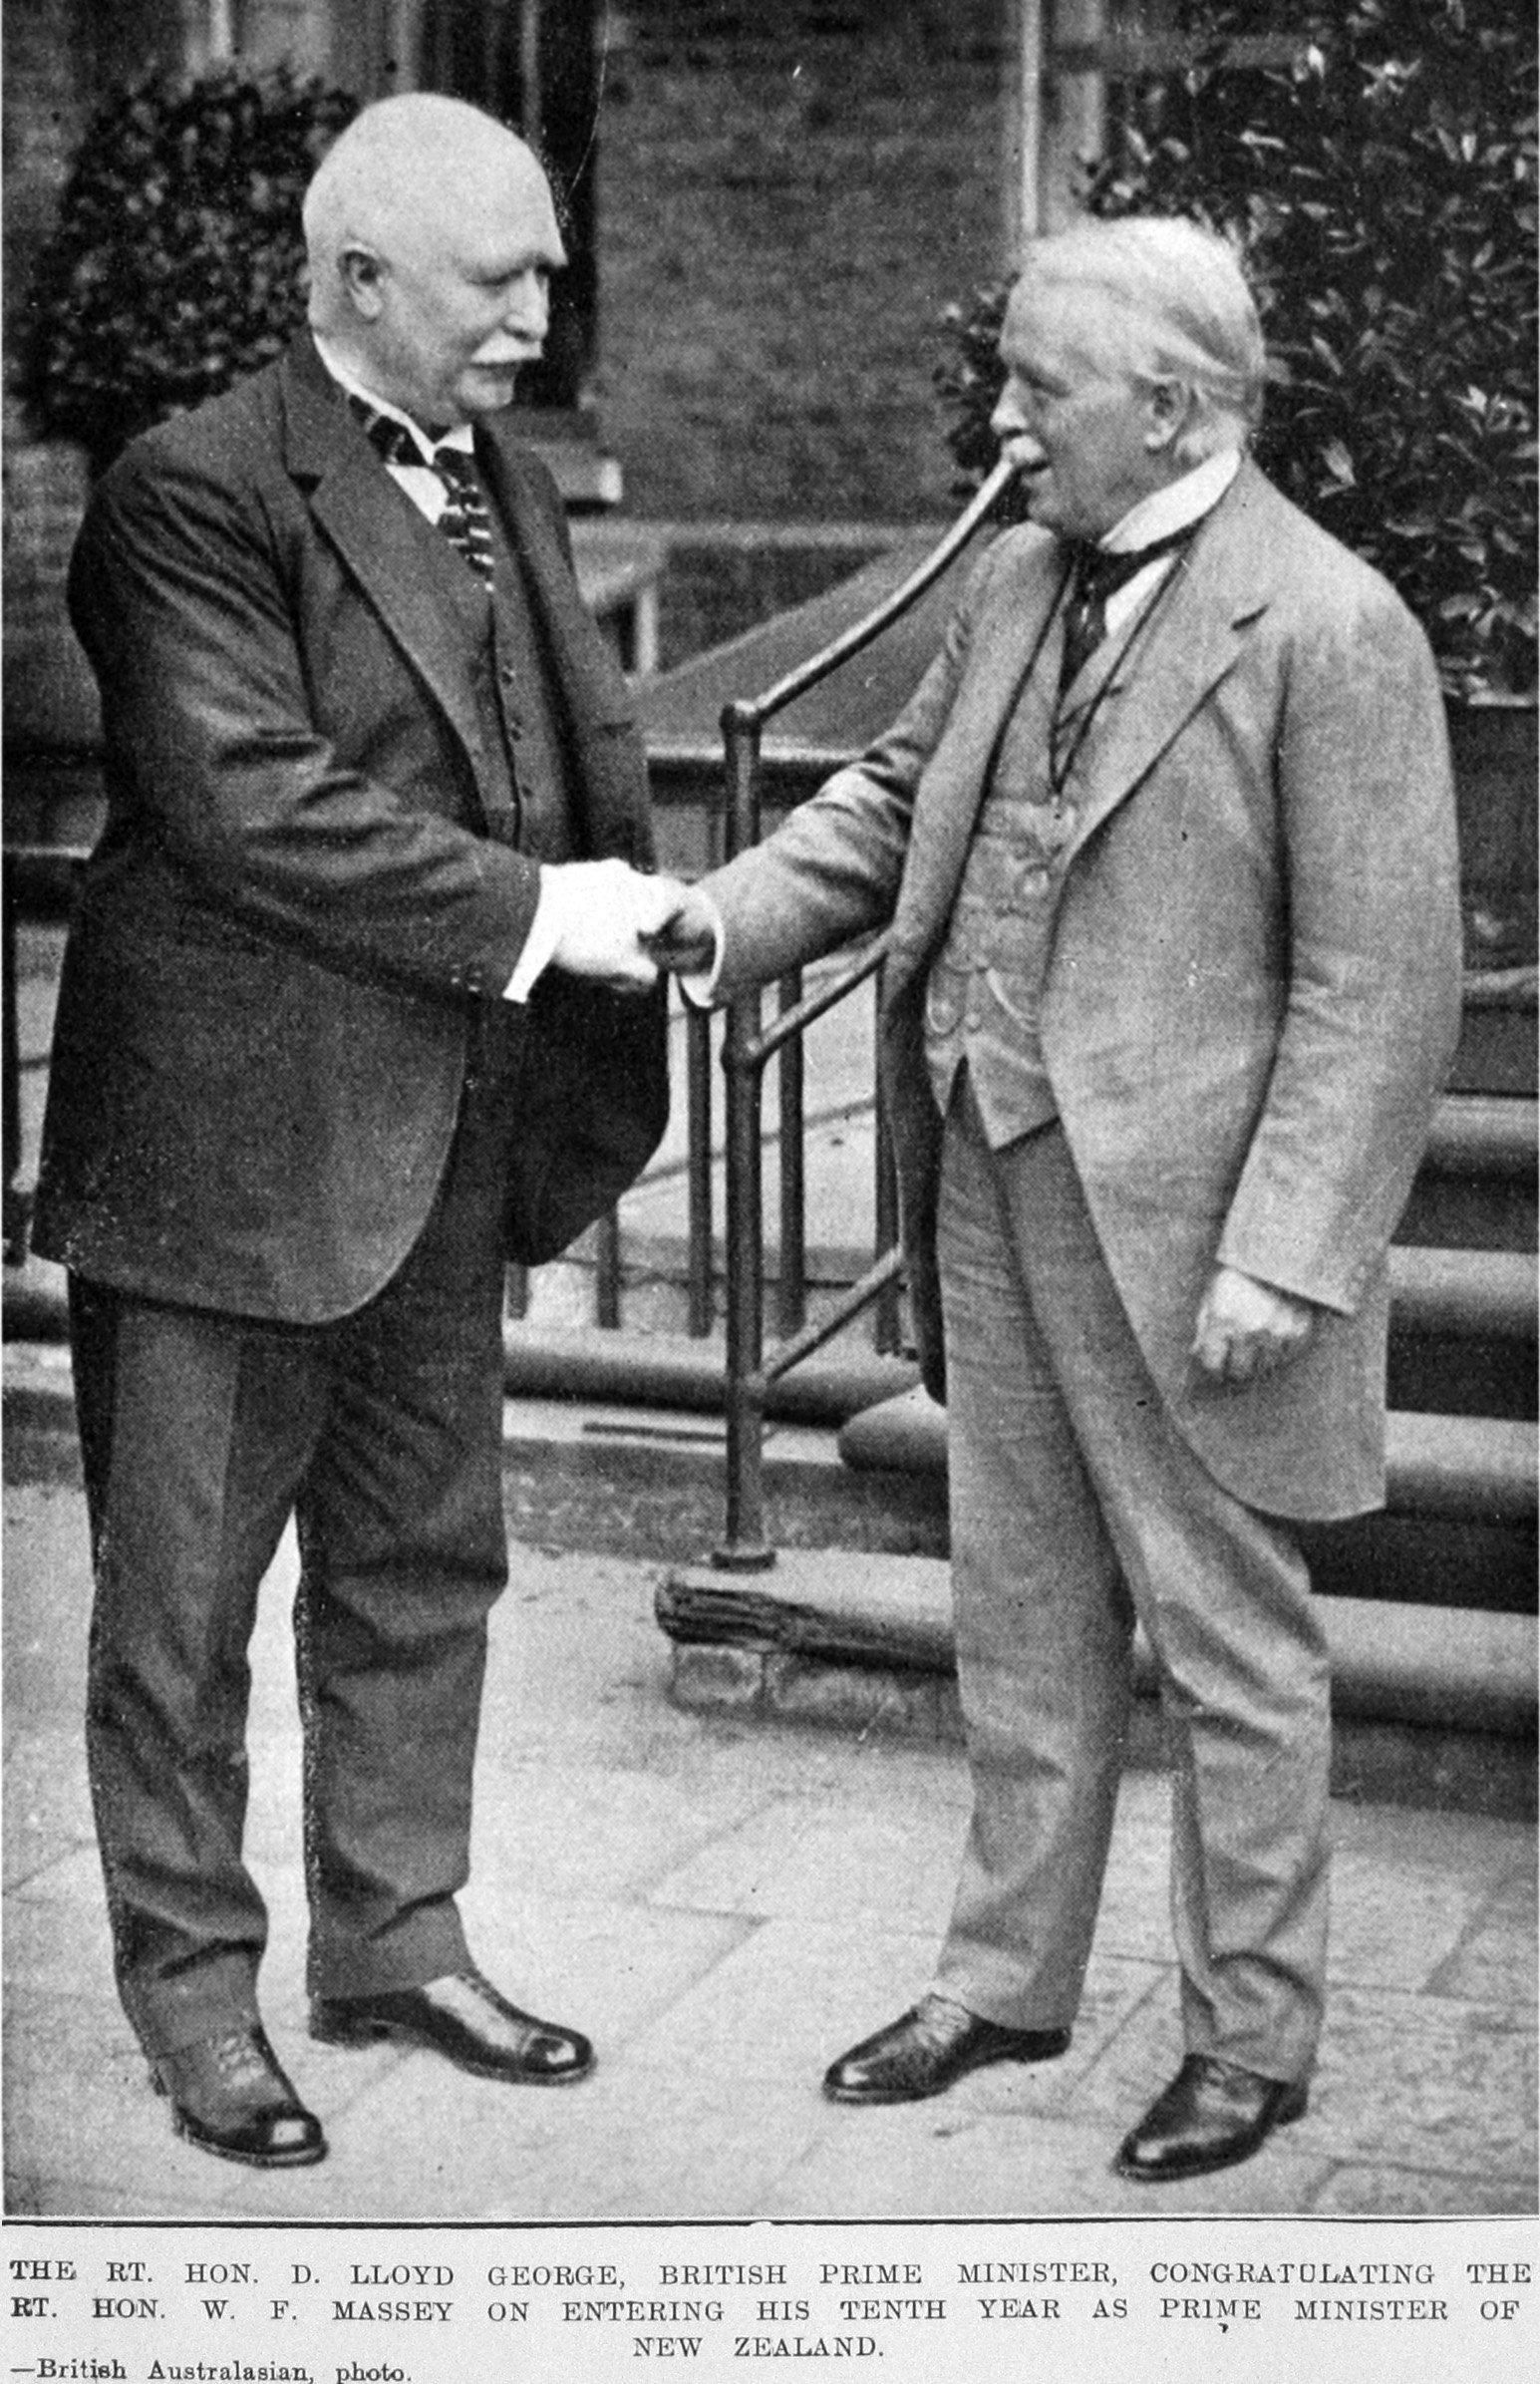 British Prime Minister Rt Hon David Lloyd George (right) congratulates Rt Hon William Massey. —...